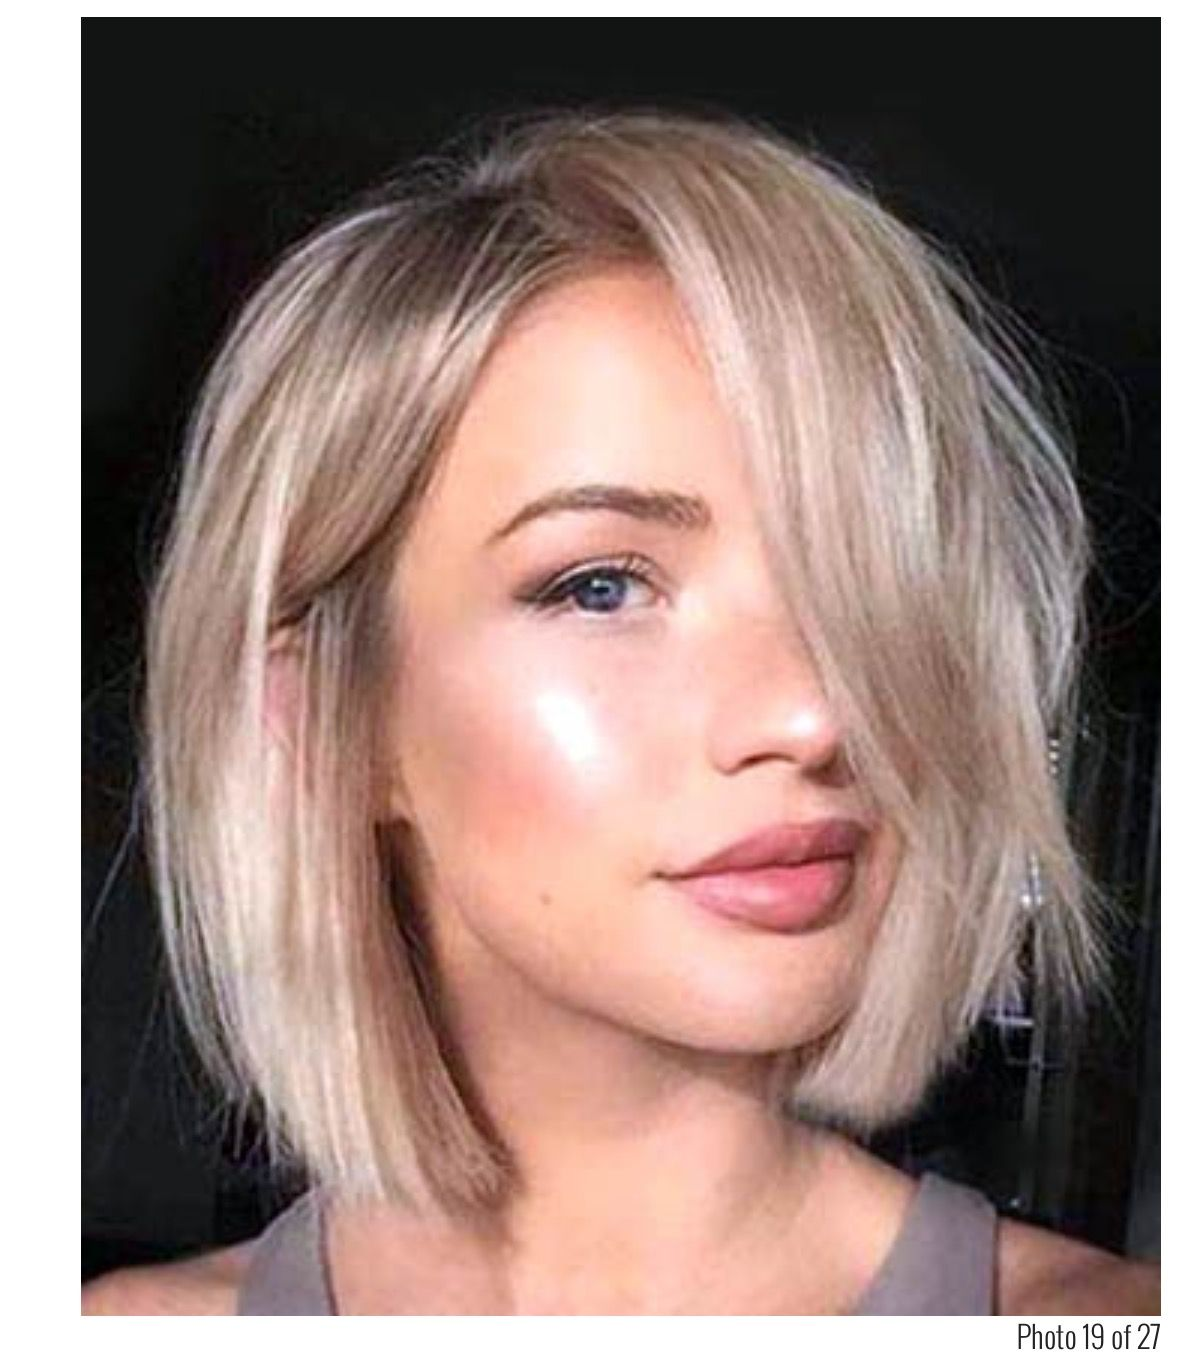 Pin by Stevie Brubaker on Hair | Pinterest | Hair cut ideas, Hair ...